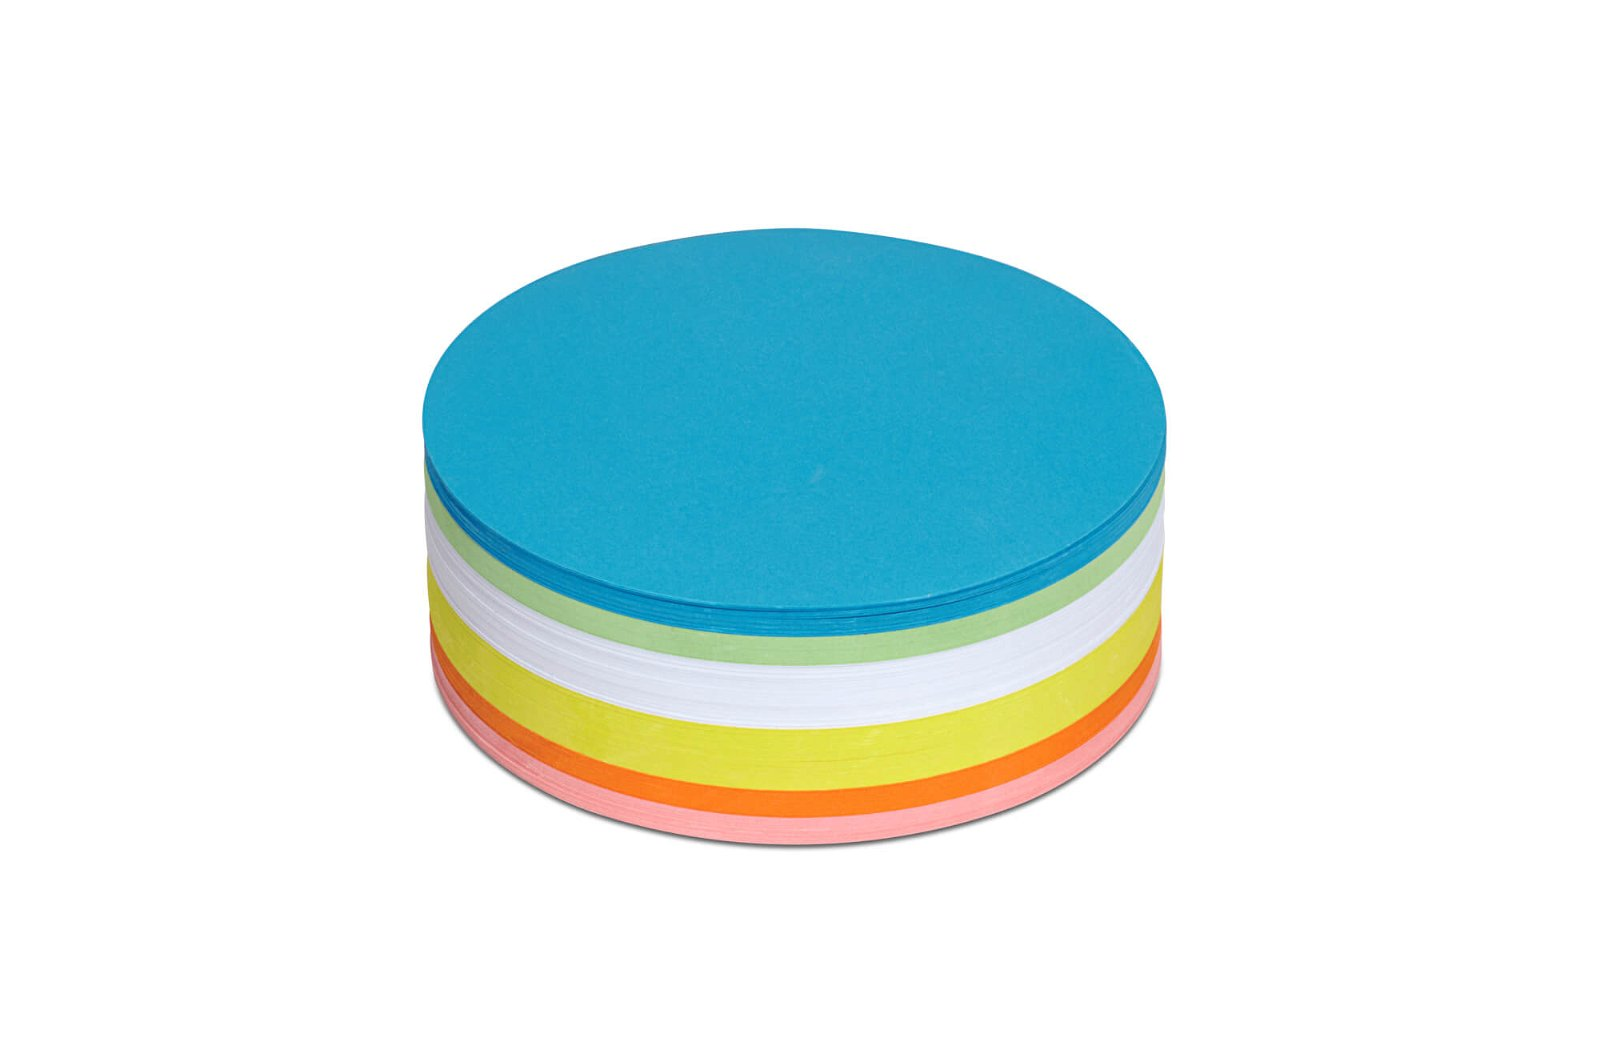 Moderationskarten rund, Ø 13,5 cm, 250 St./Pack, farbig sortiert